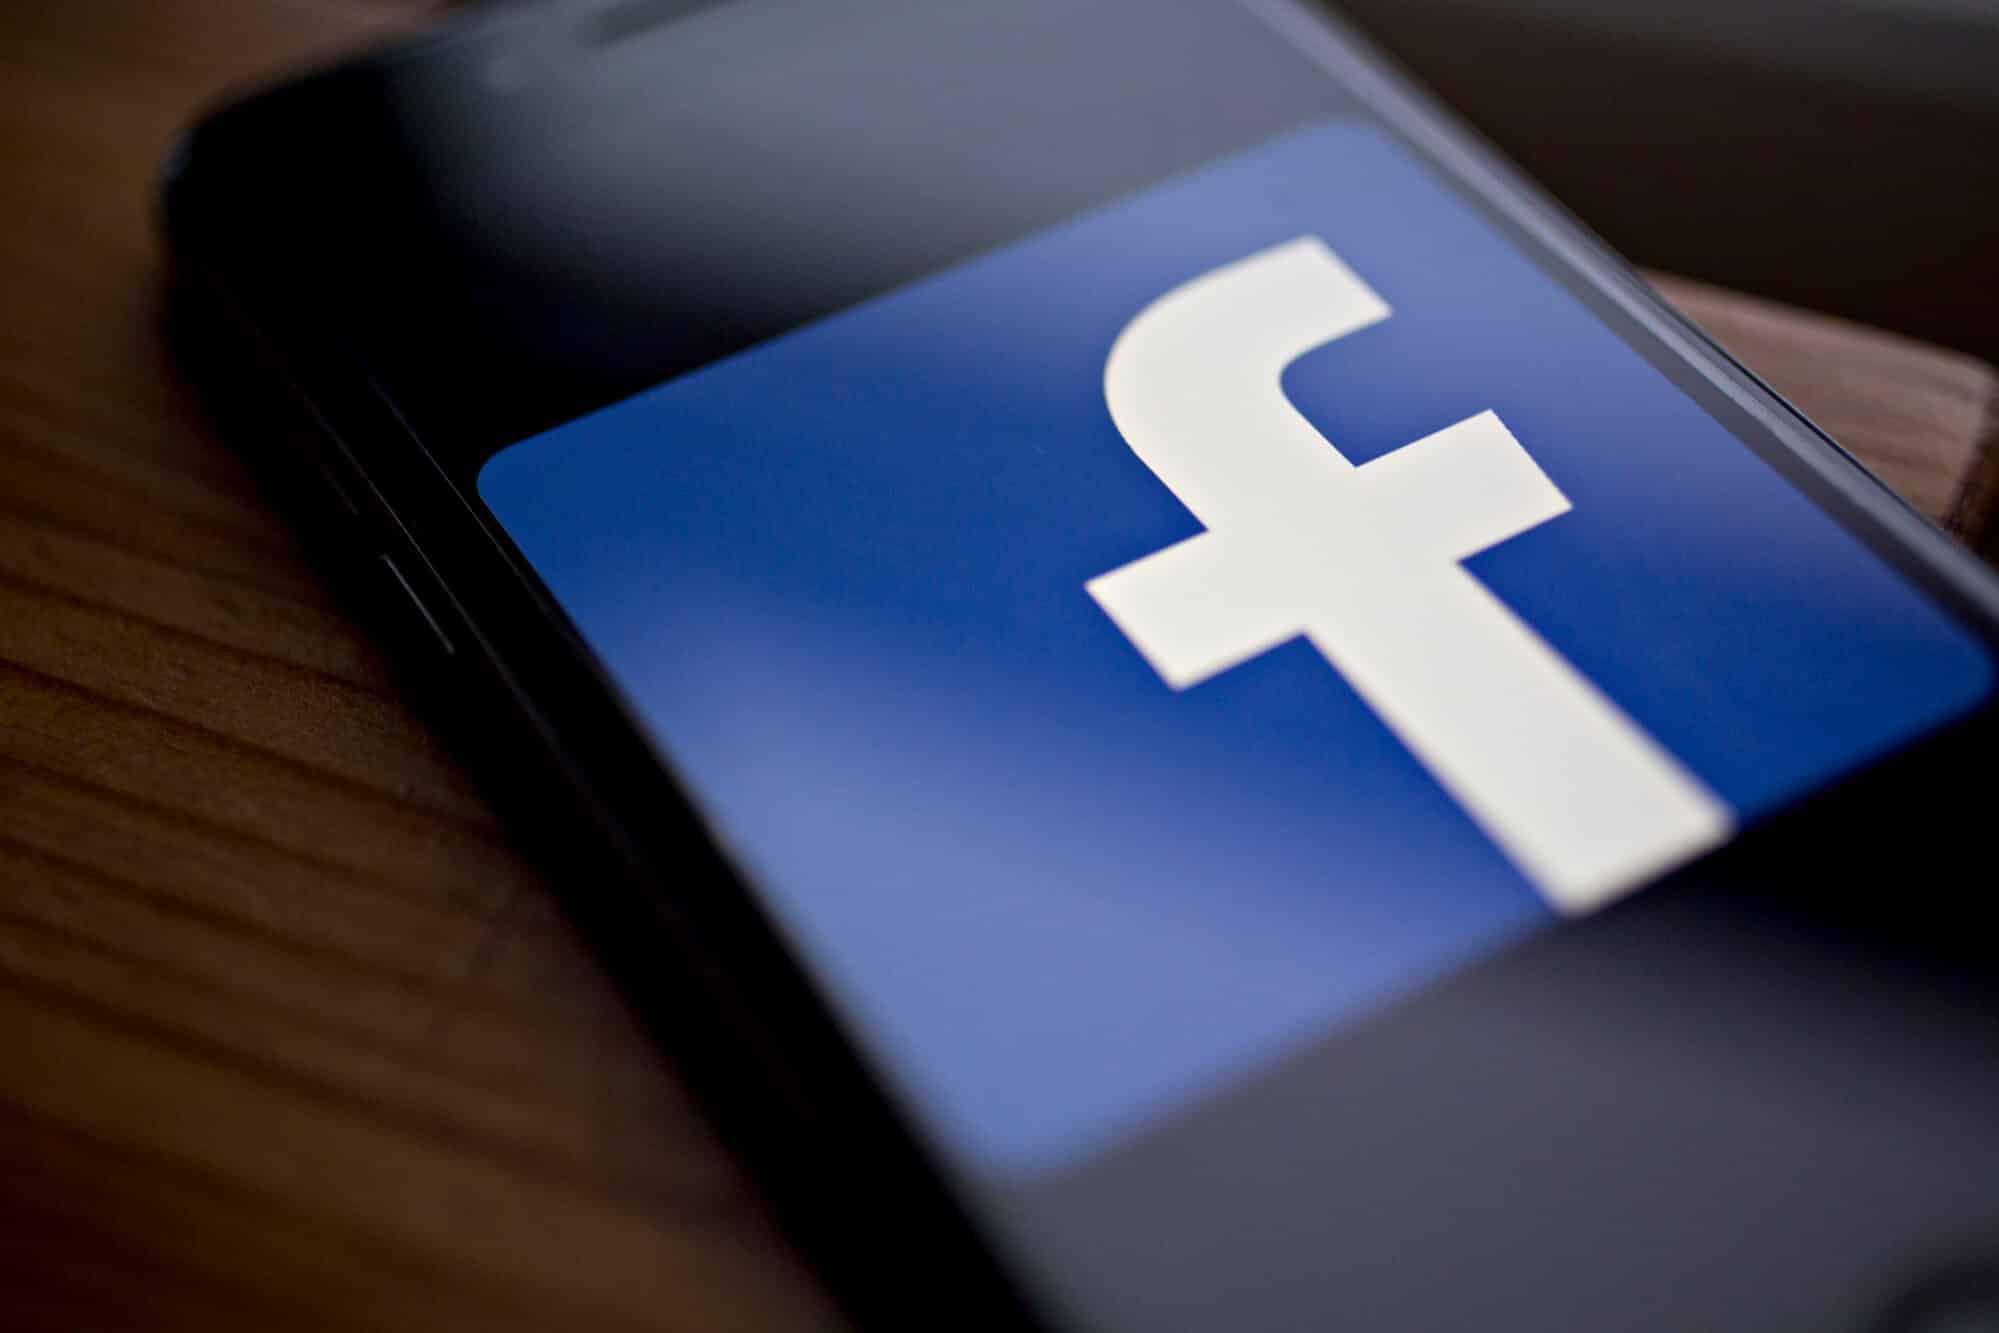 Apple alleges Facebook